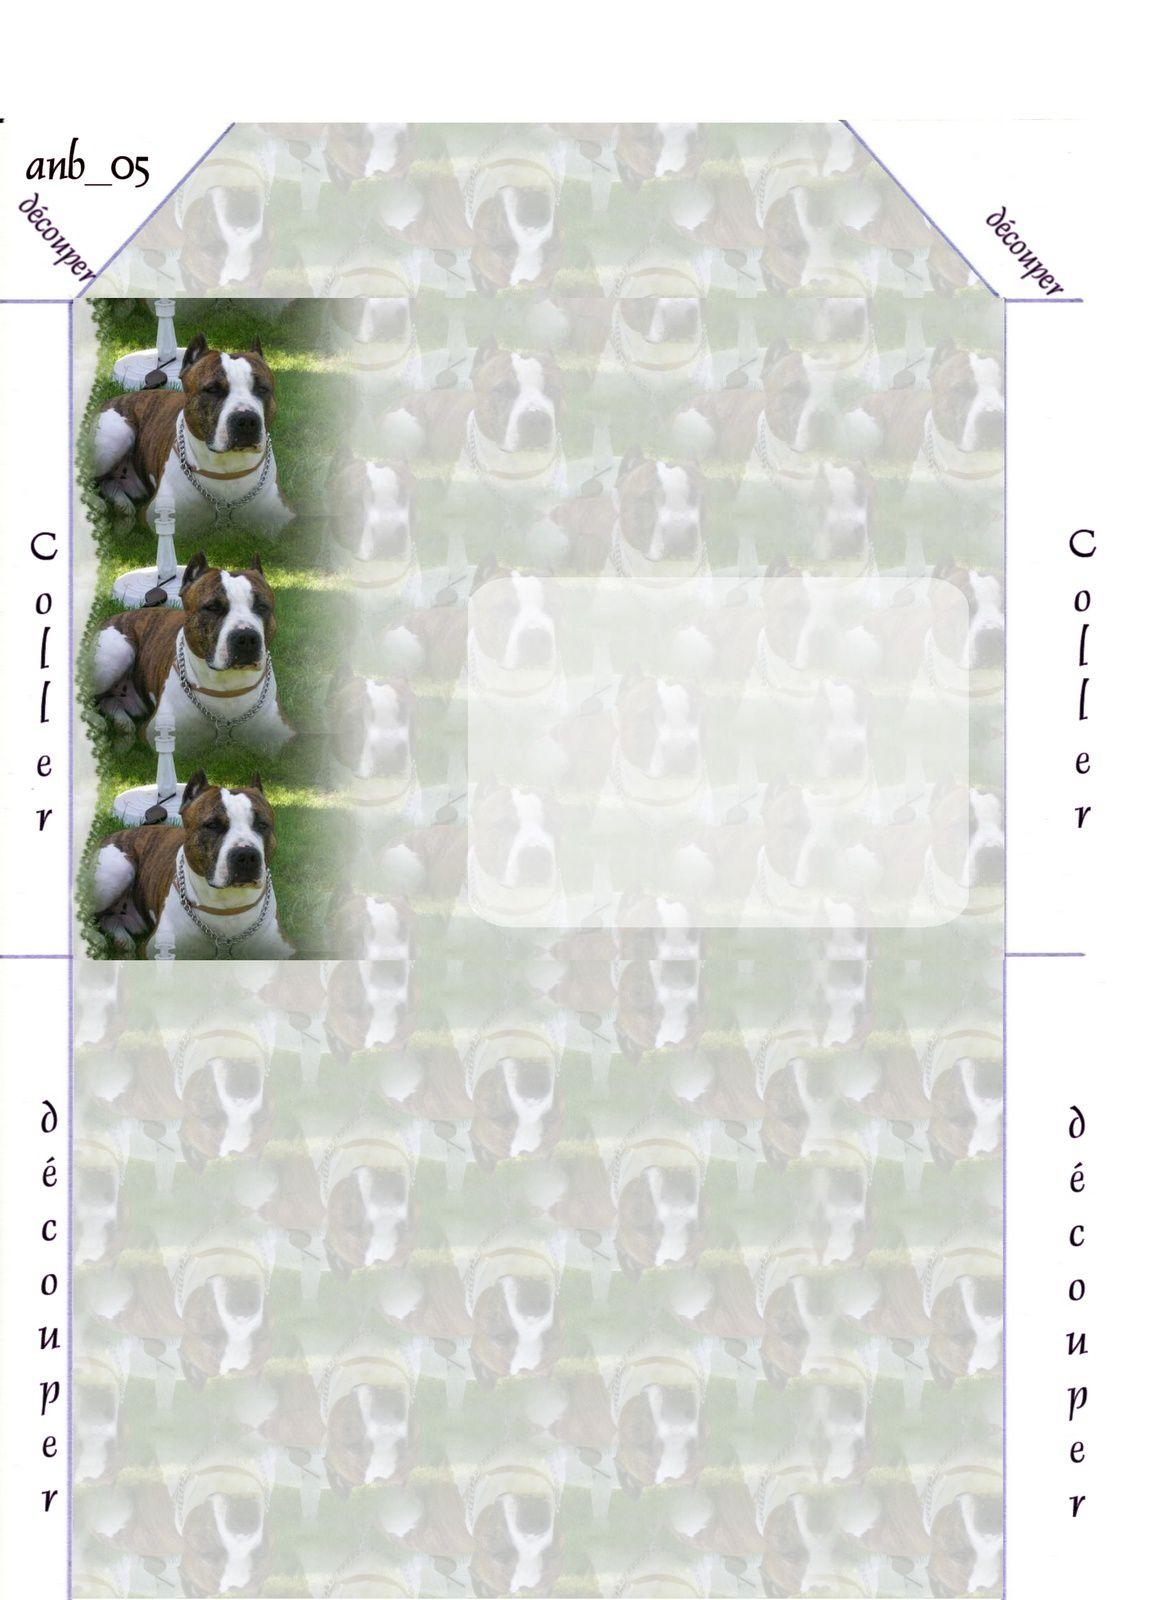 Chien Incredimail &amp&#x3B; Papier A4 h l &amp&#x3B; outlook &amp&#x3B; enveloppe &amp&#x3B; 2 cartes A5 &amp&#x3B; signets 3 langues  chien_thor_p6090057_00